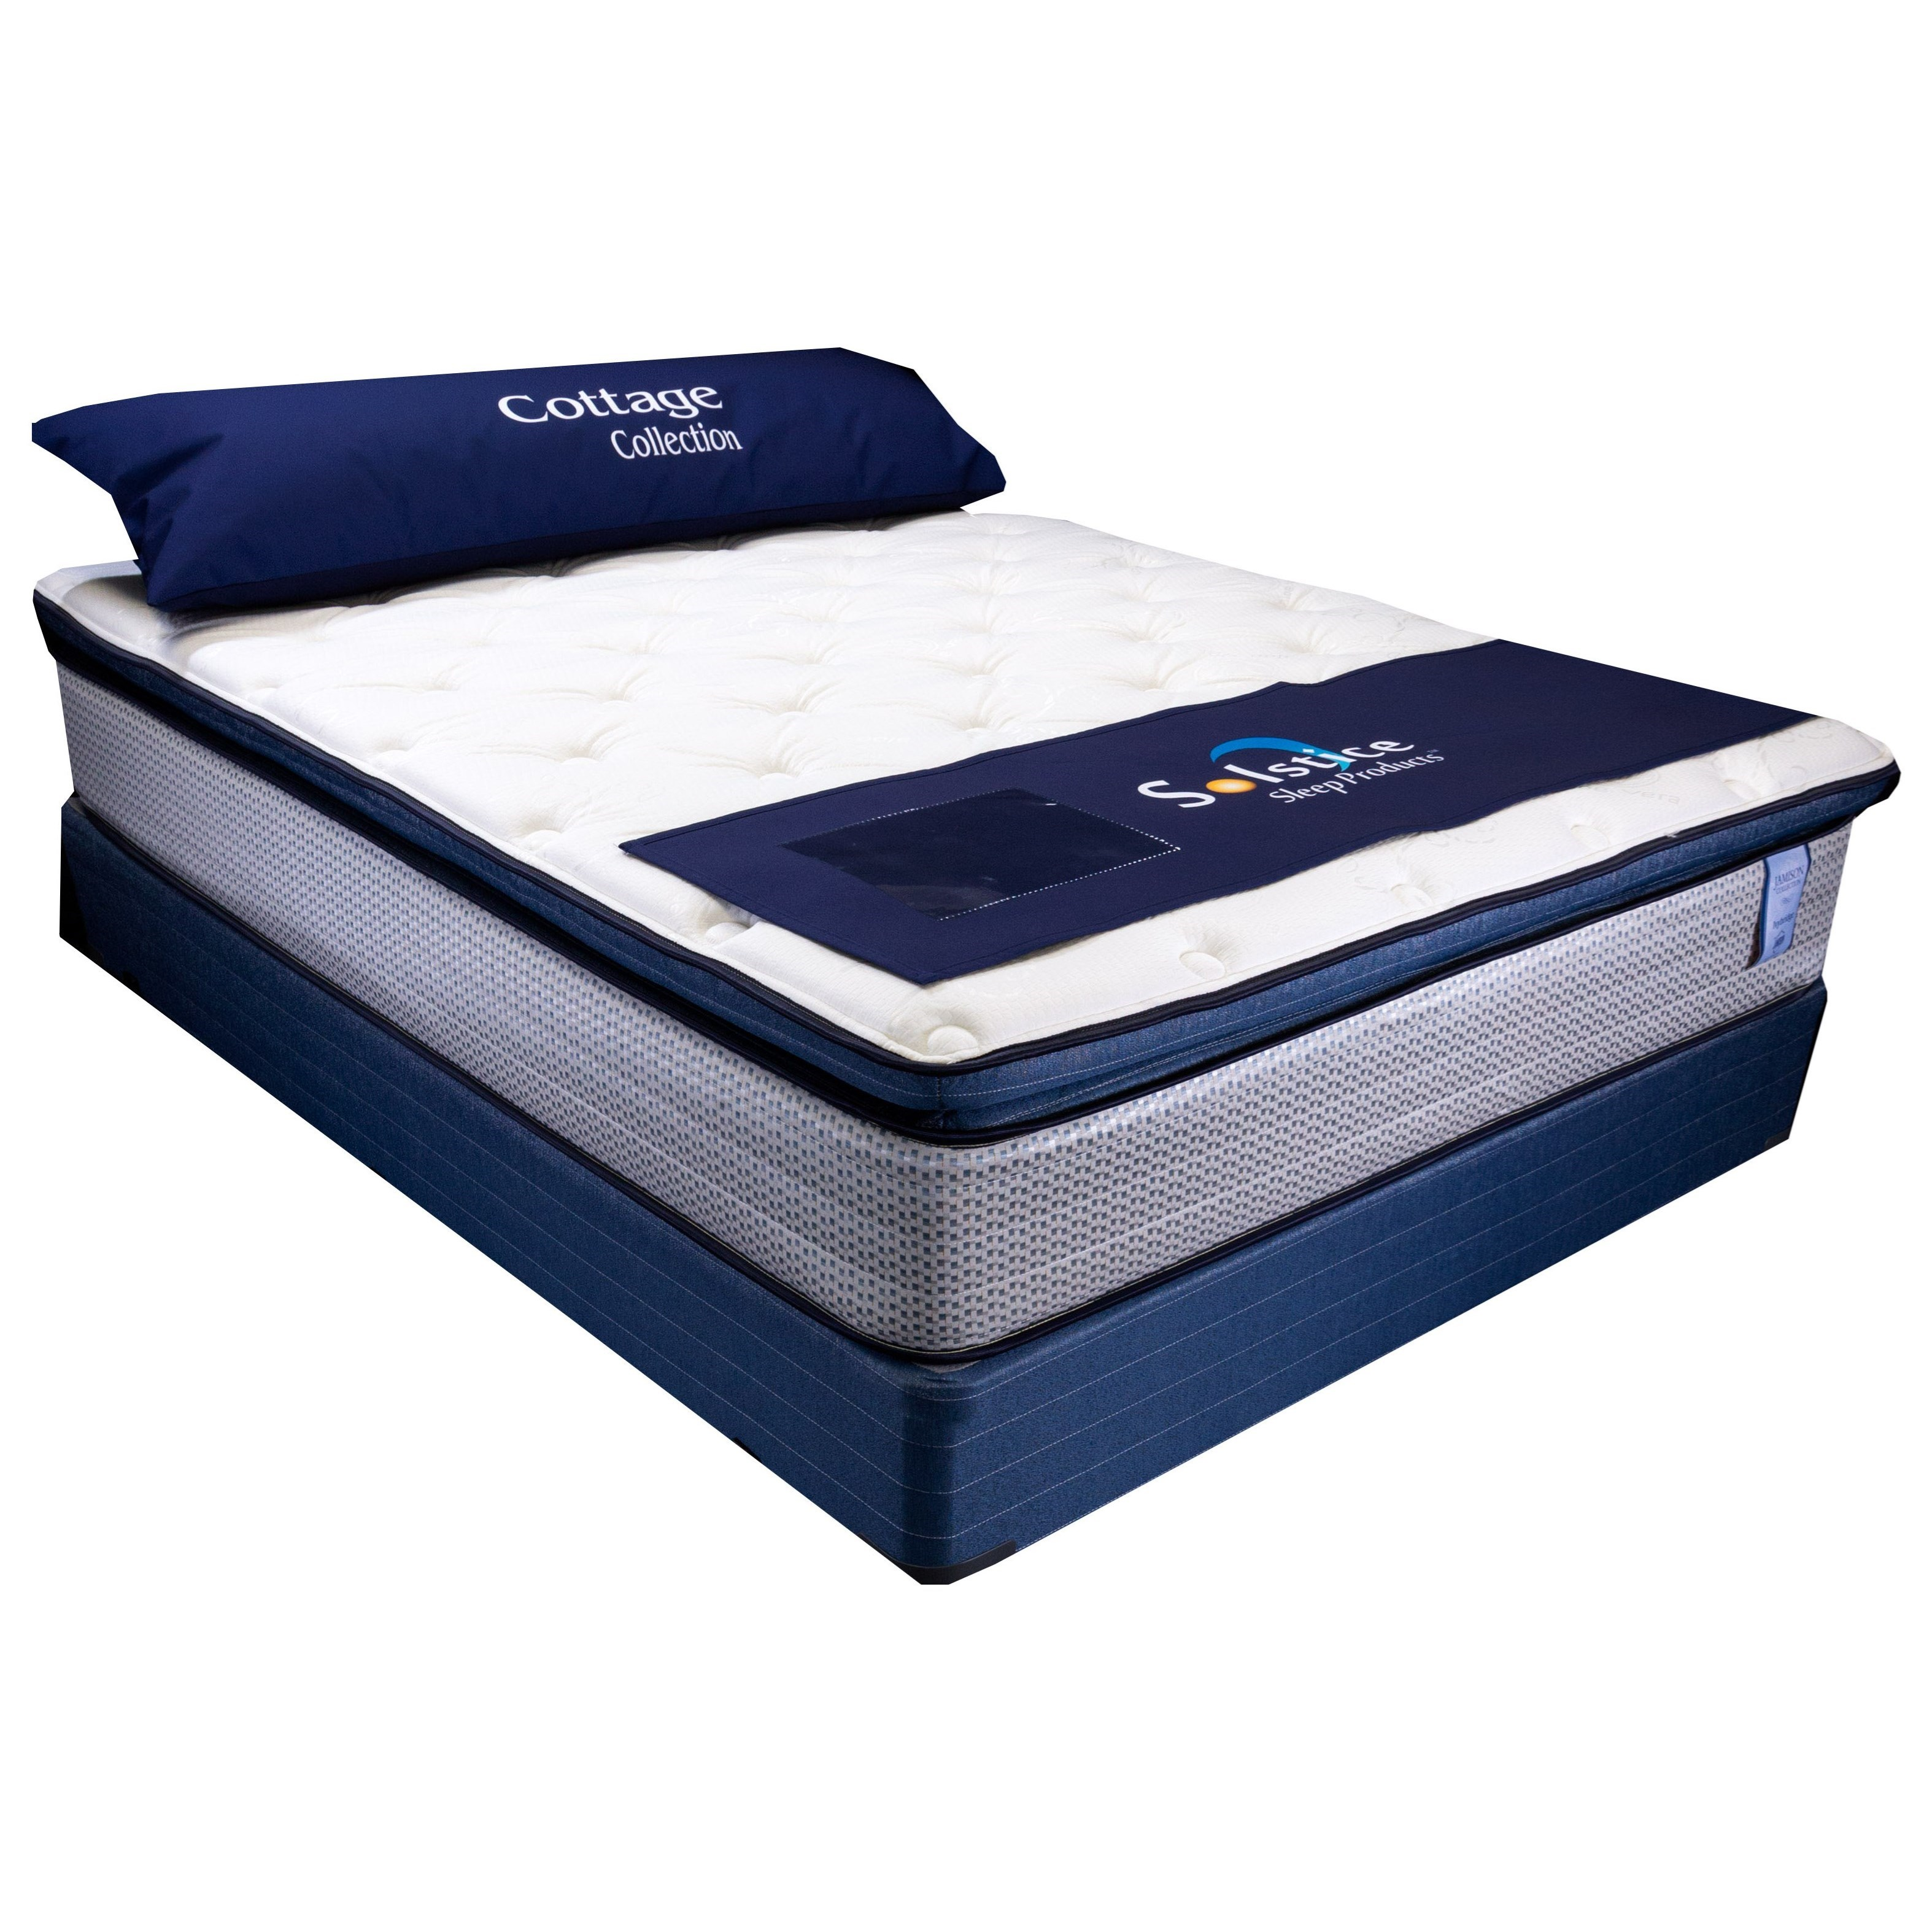 "Hampton Pillow Top II Twin 13"" Pillow Top Mattress Set by Solstice Sleep Products at Virginia Furniture Market"